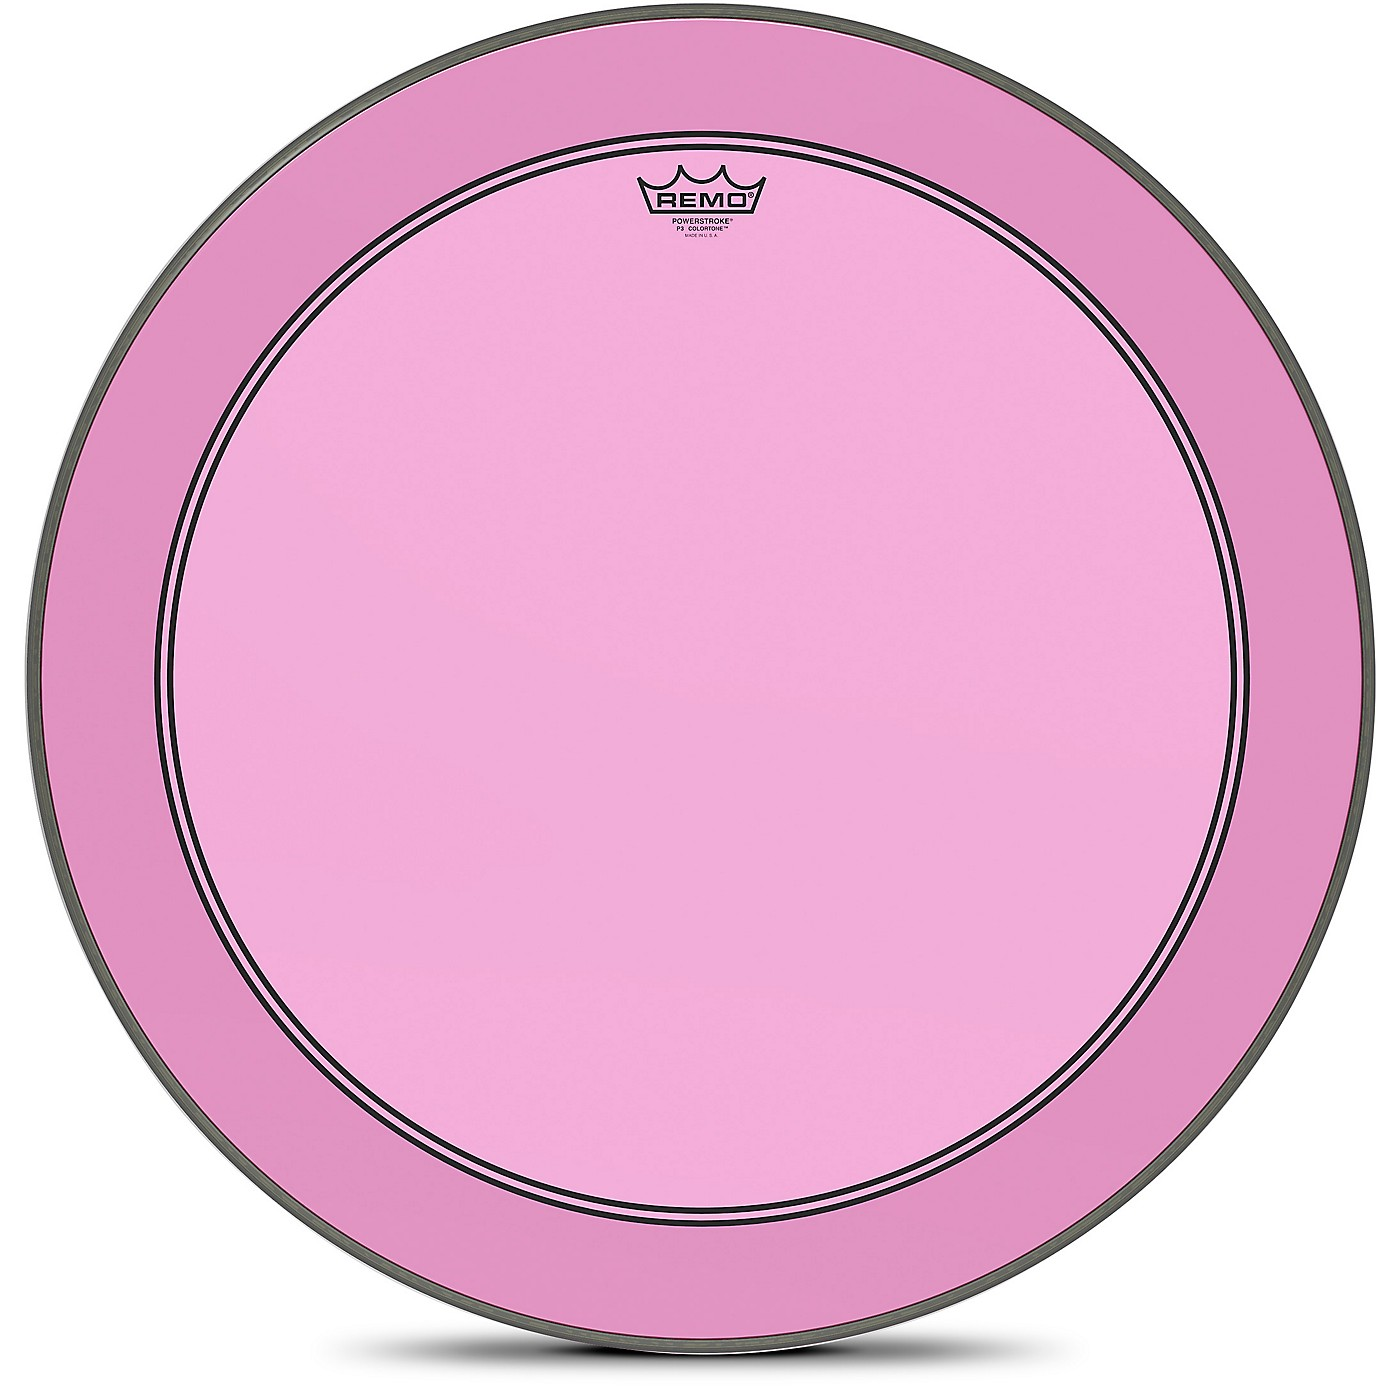 Remo Powerstroke P3 Colortone Pink Bass Drum Head thumbnail